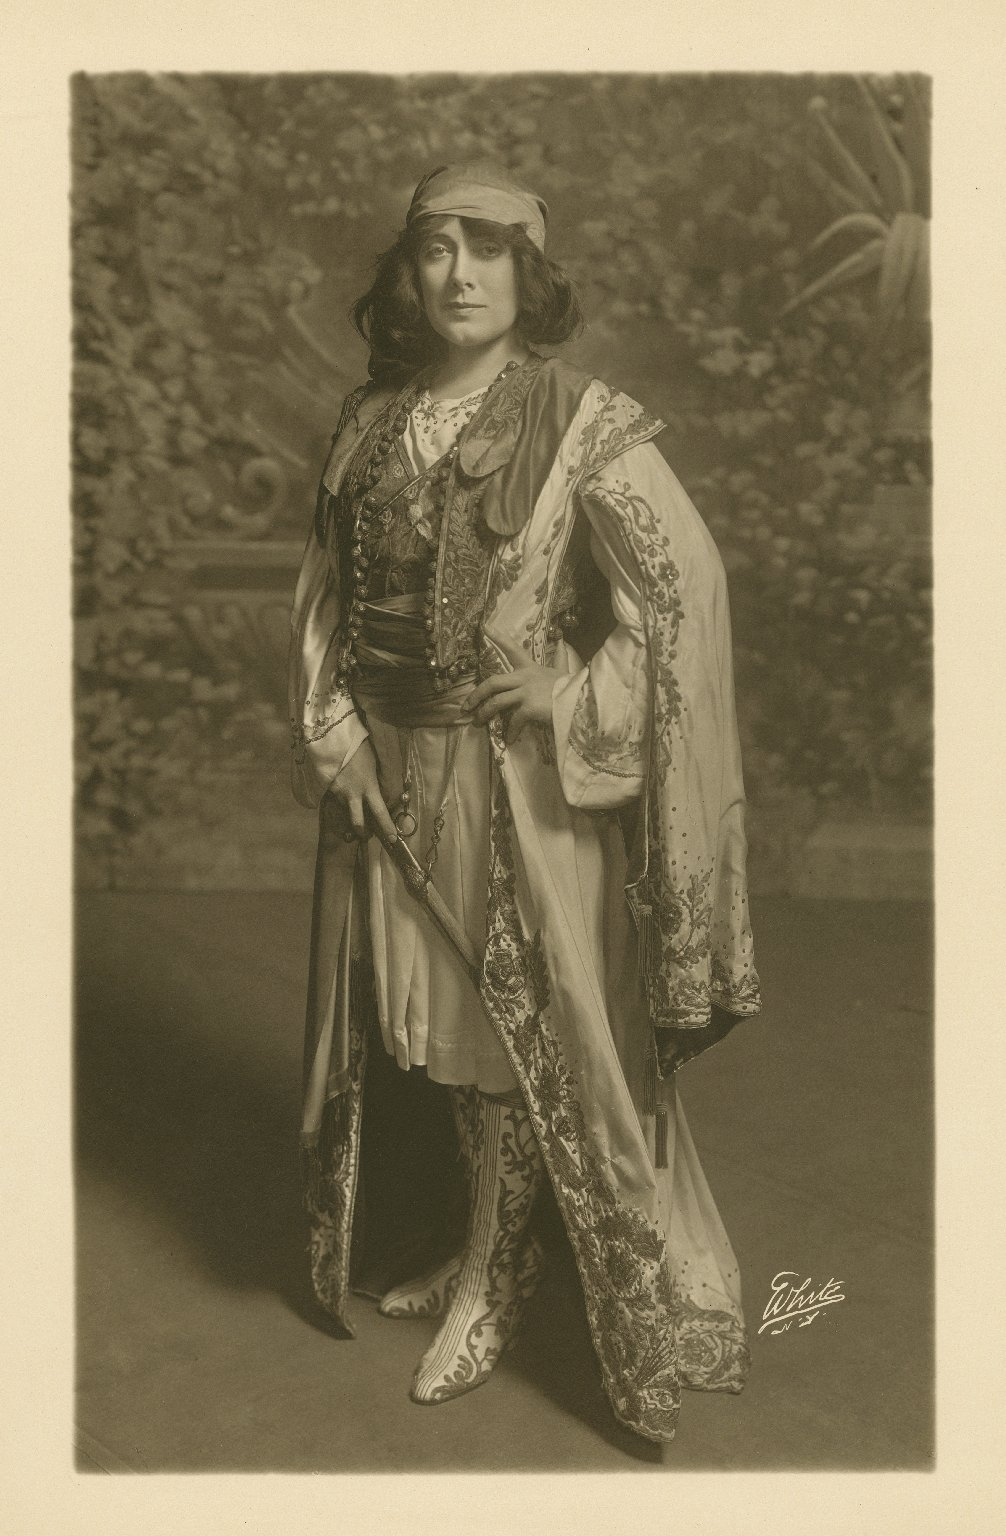 [Julia Marlowe as Viola in Shakespeare's Twelfth night] [graphic] / White.